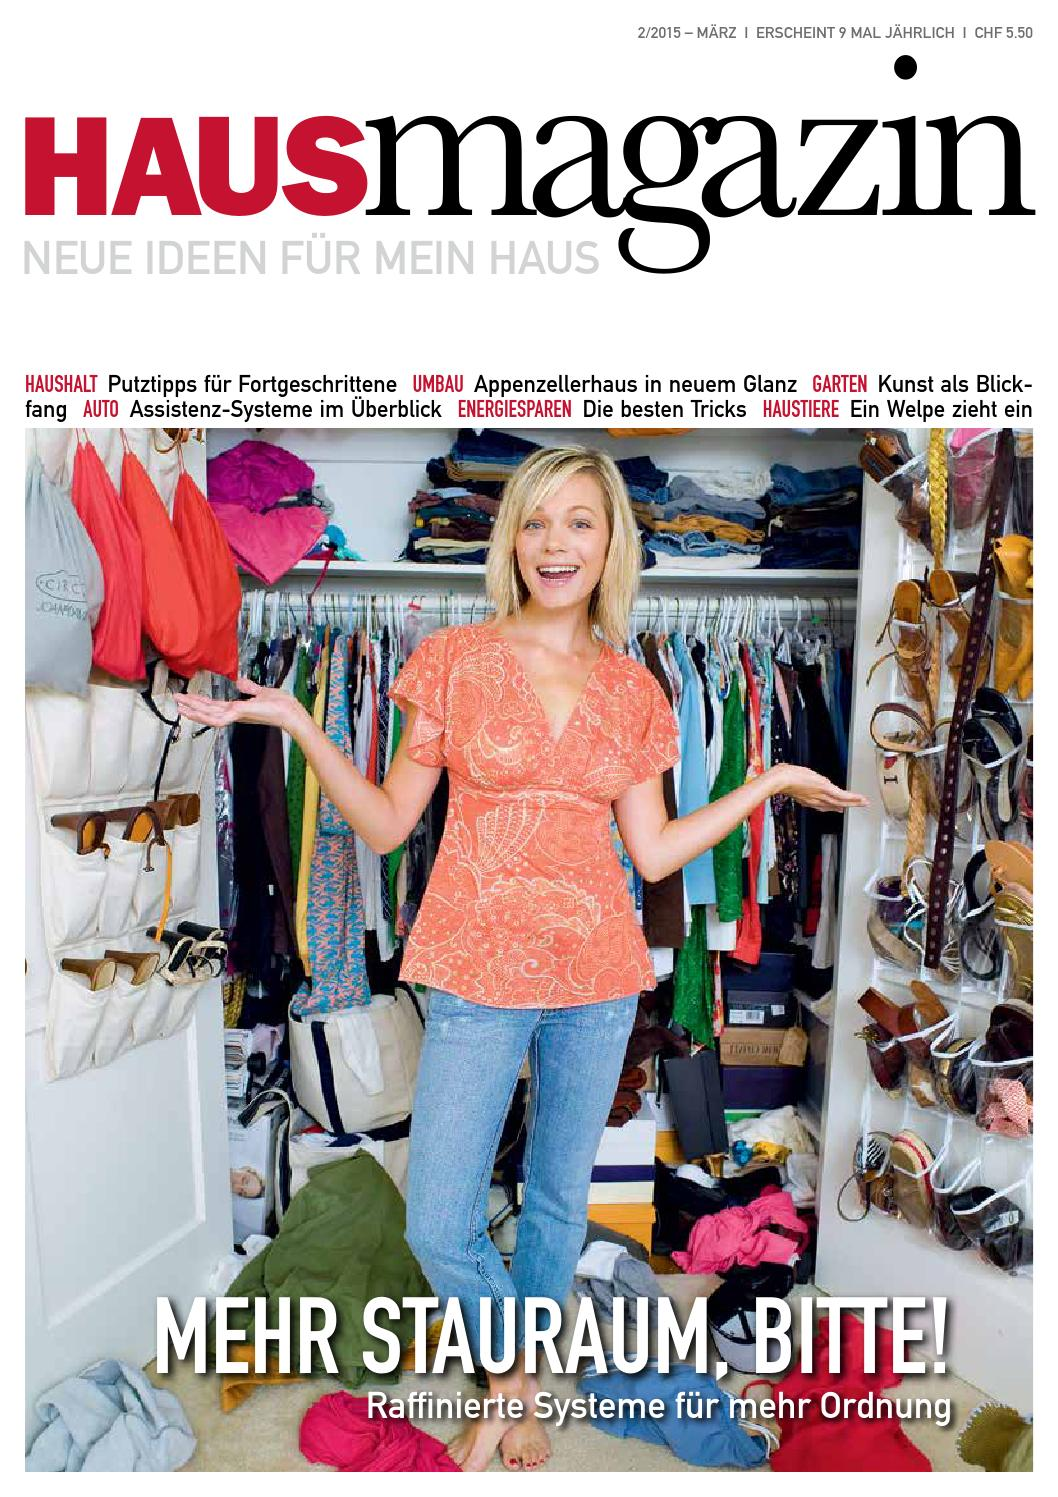 Hausmagazin März 2015 by HAUS MAGAZIN - issuu